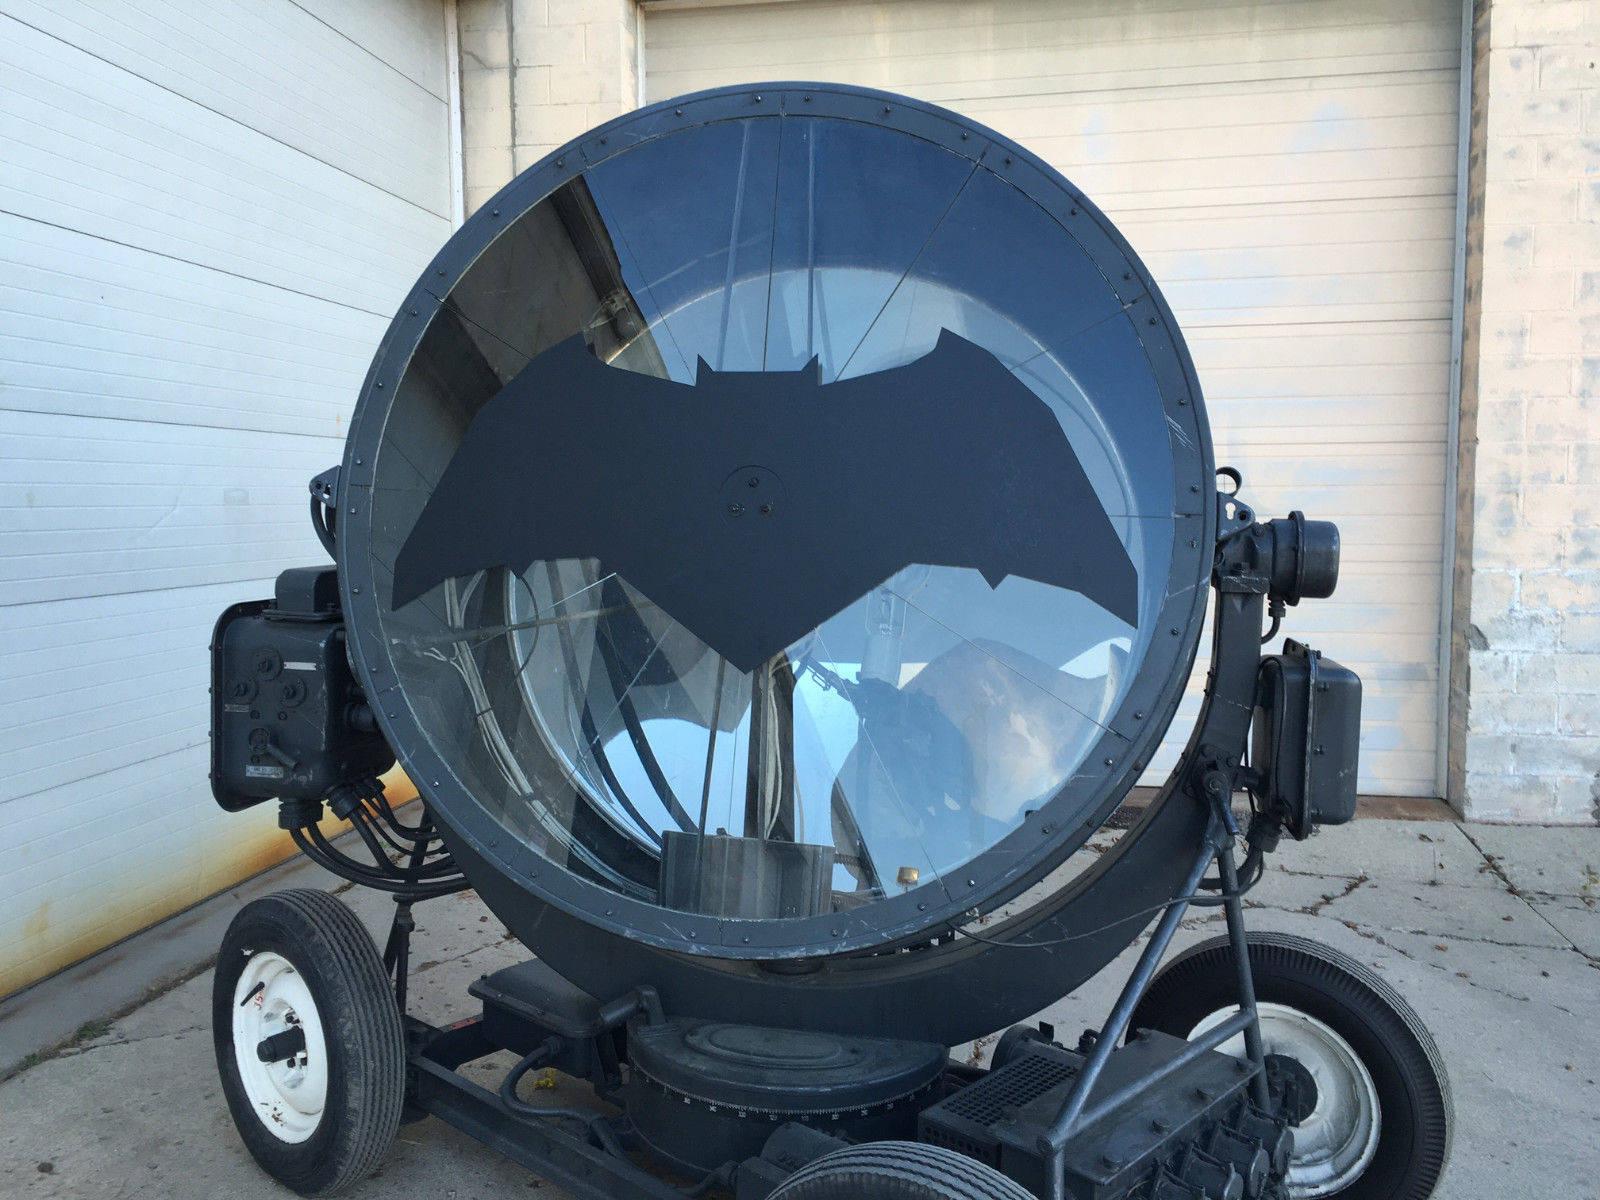 Batman V Superman's Bat Signal Is For Sale on eBay